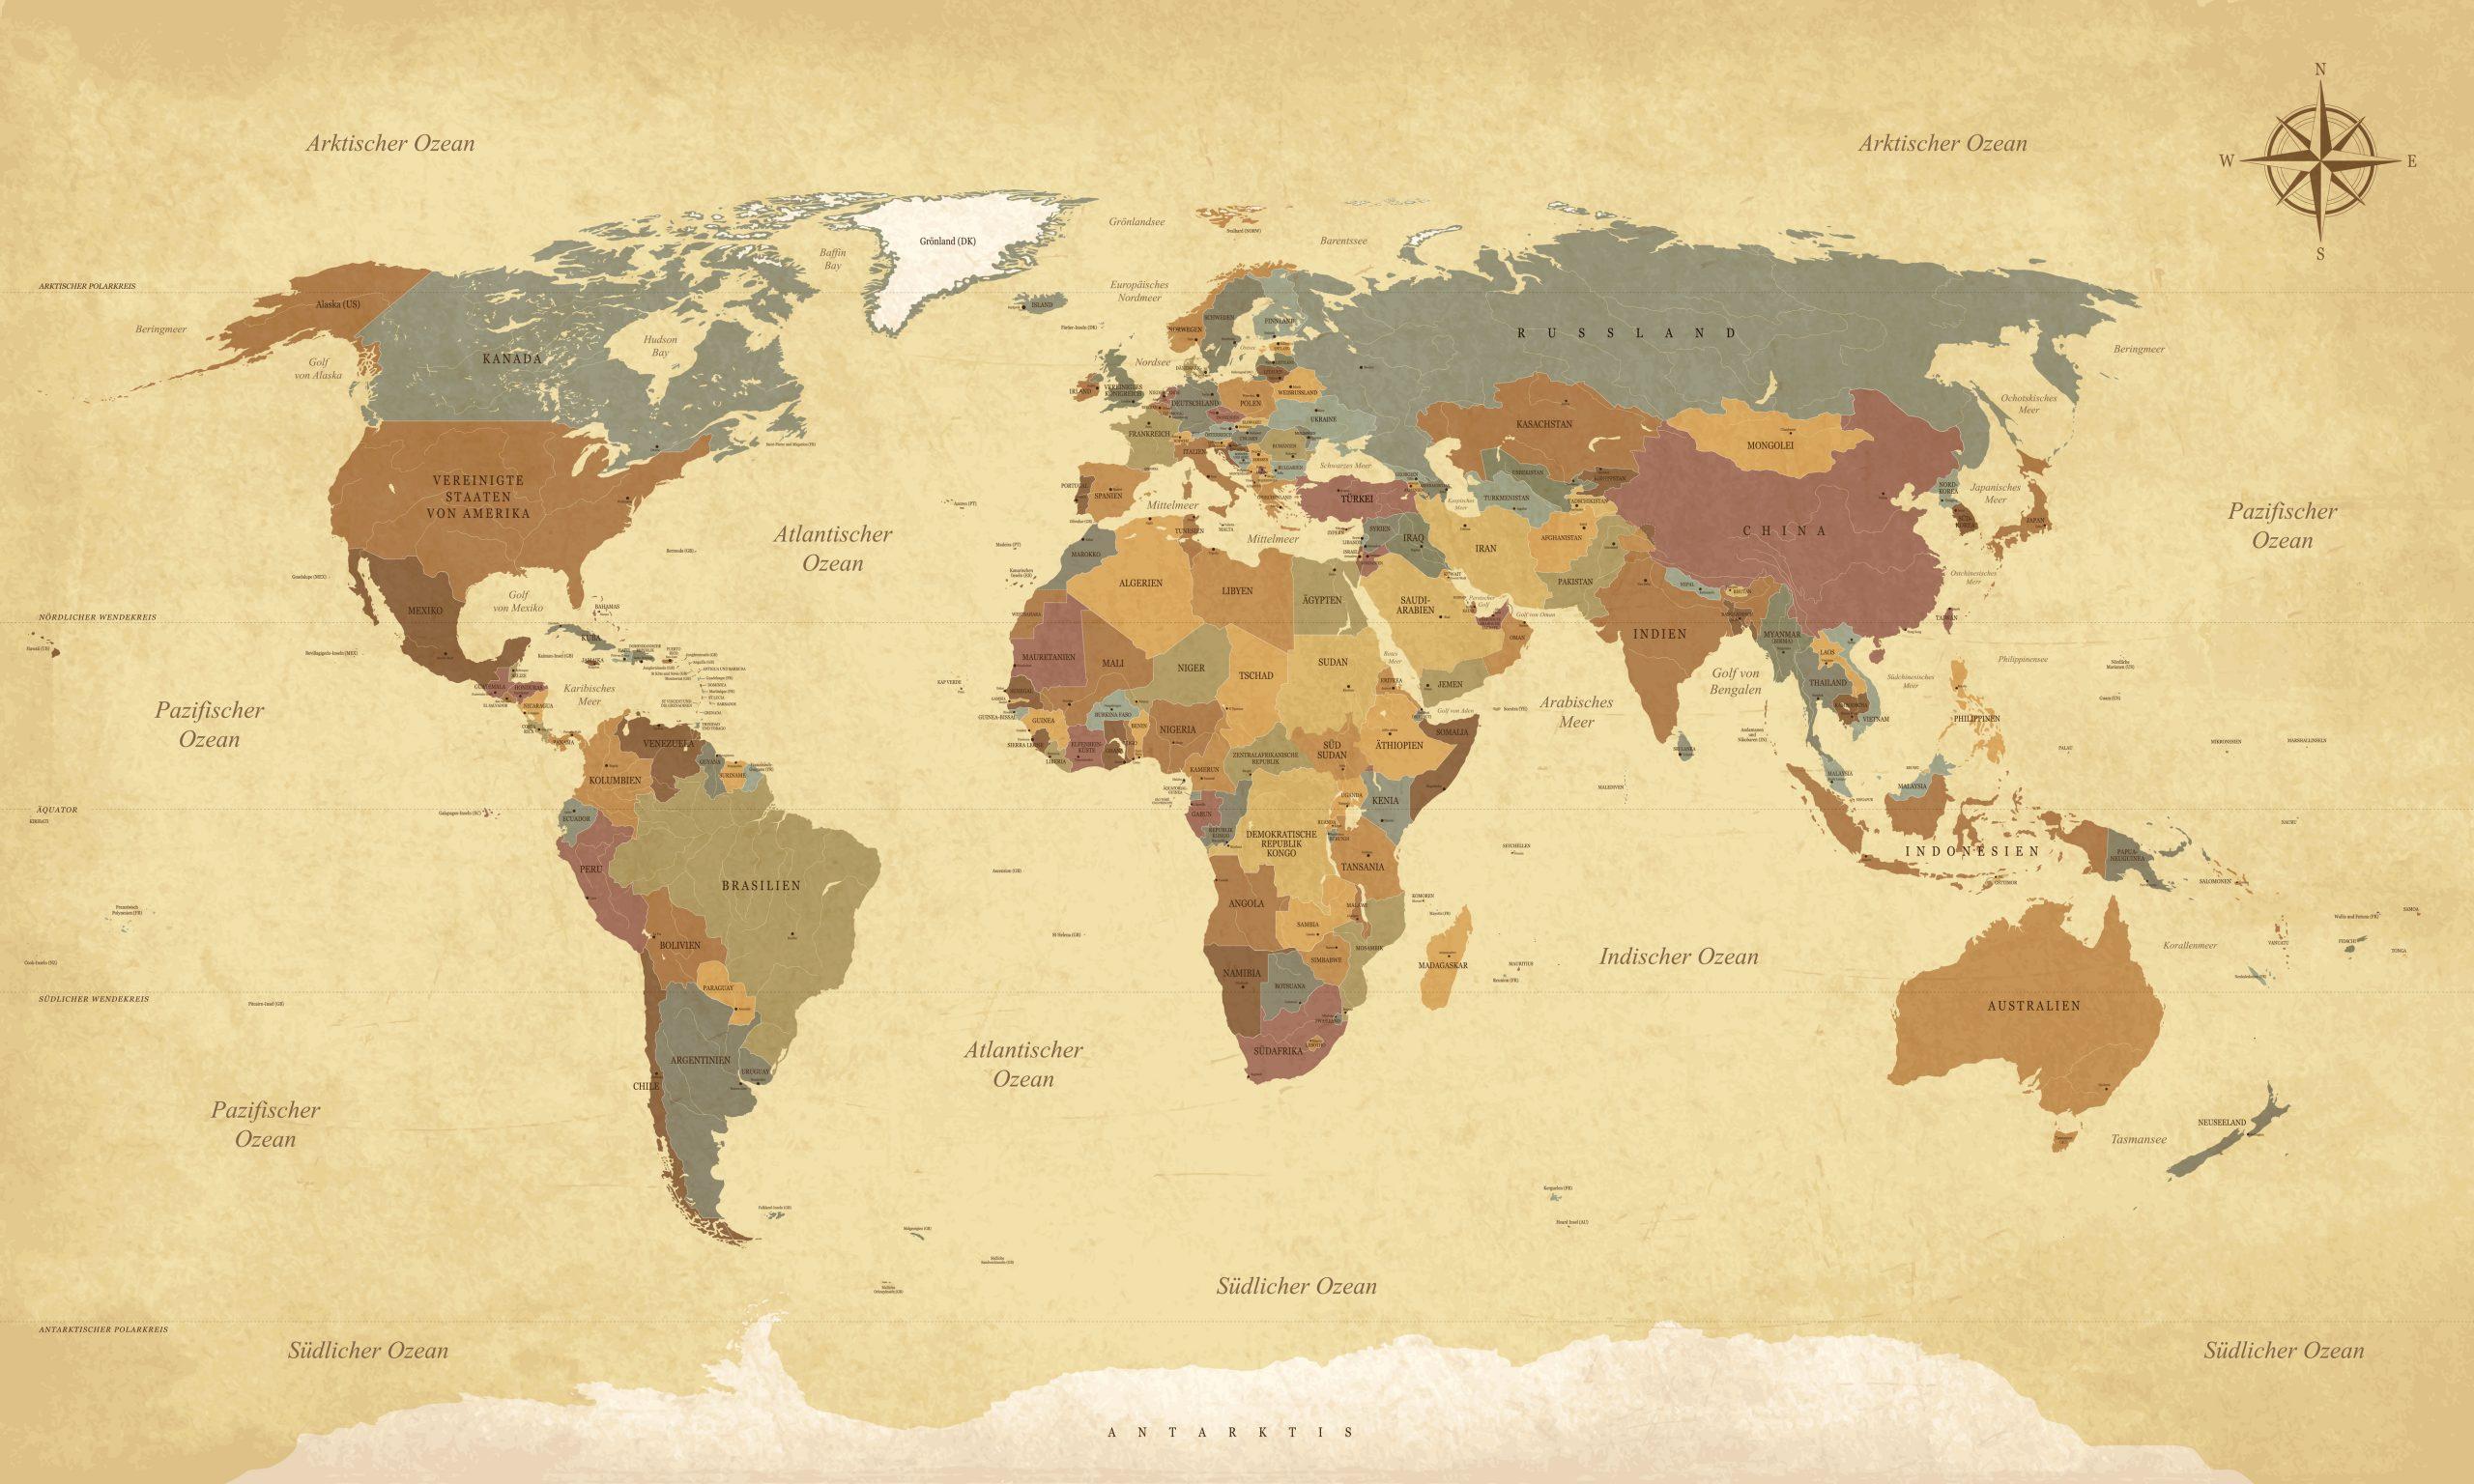 Textured vintage world map - German language - Vector